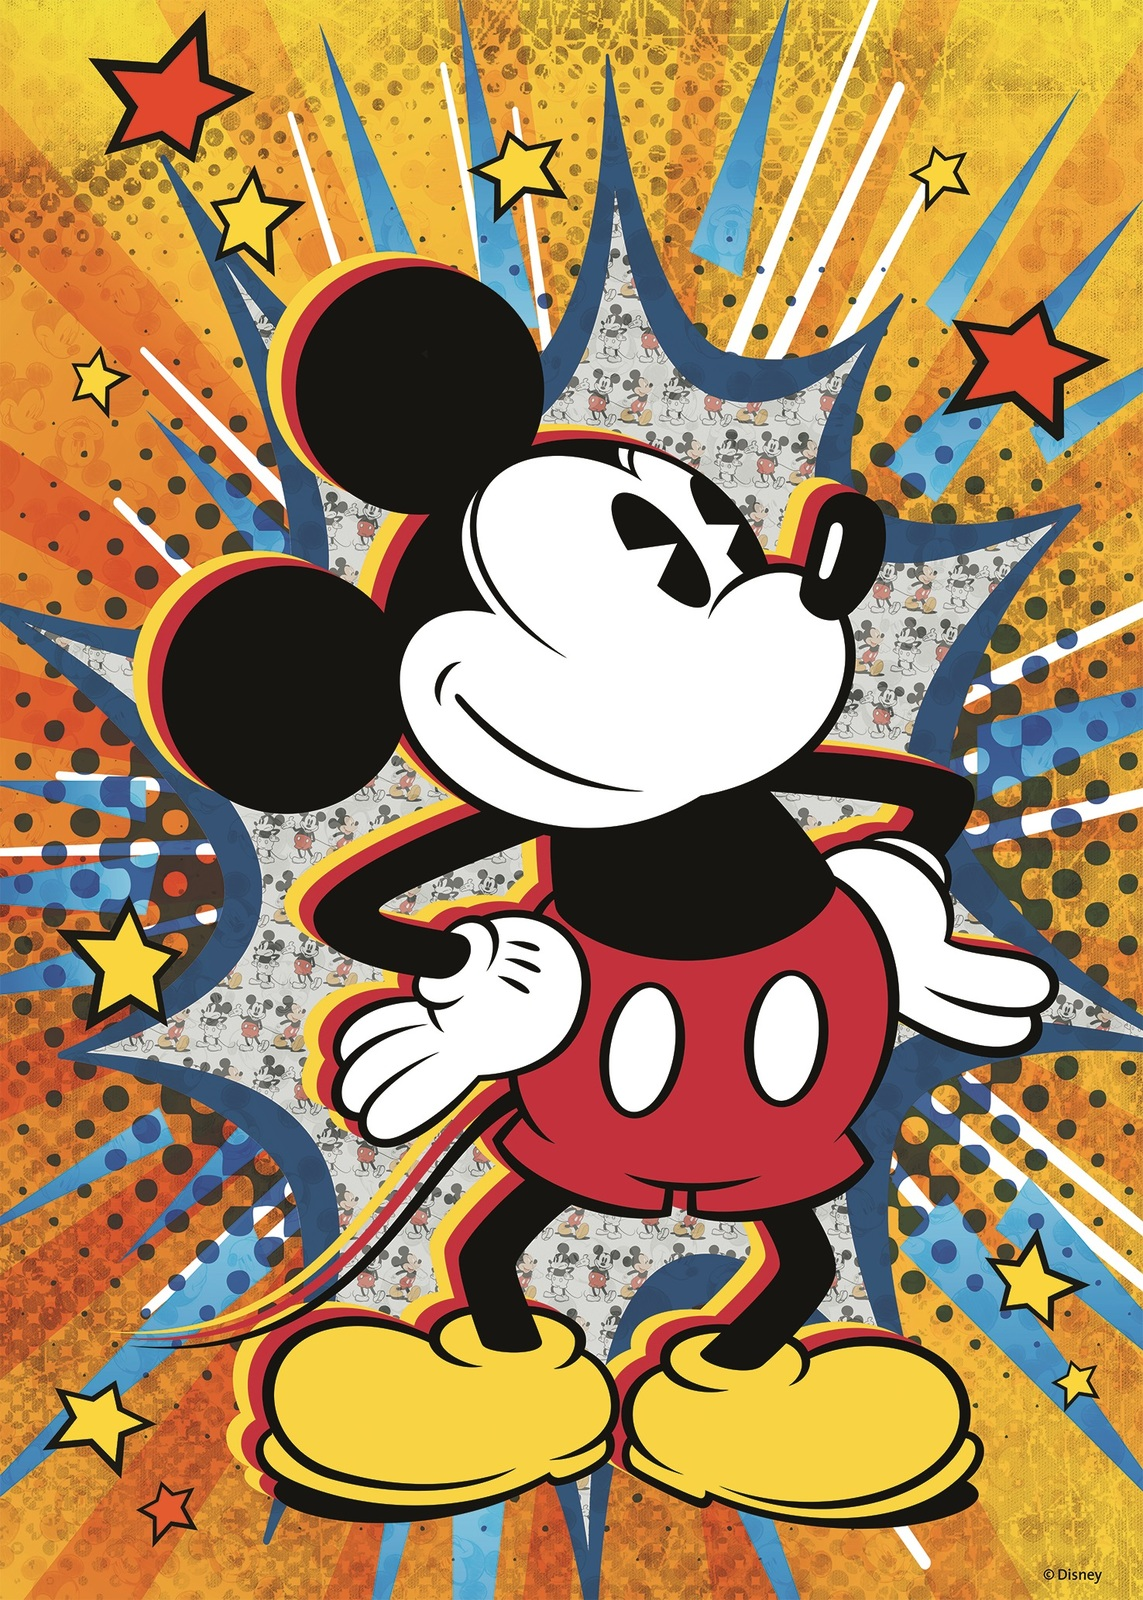 Ravensburger: 1,000 Piece Puzzle - Retro Mickey Mouse image